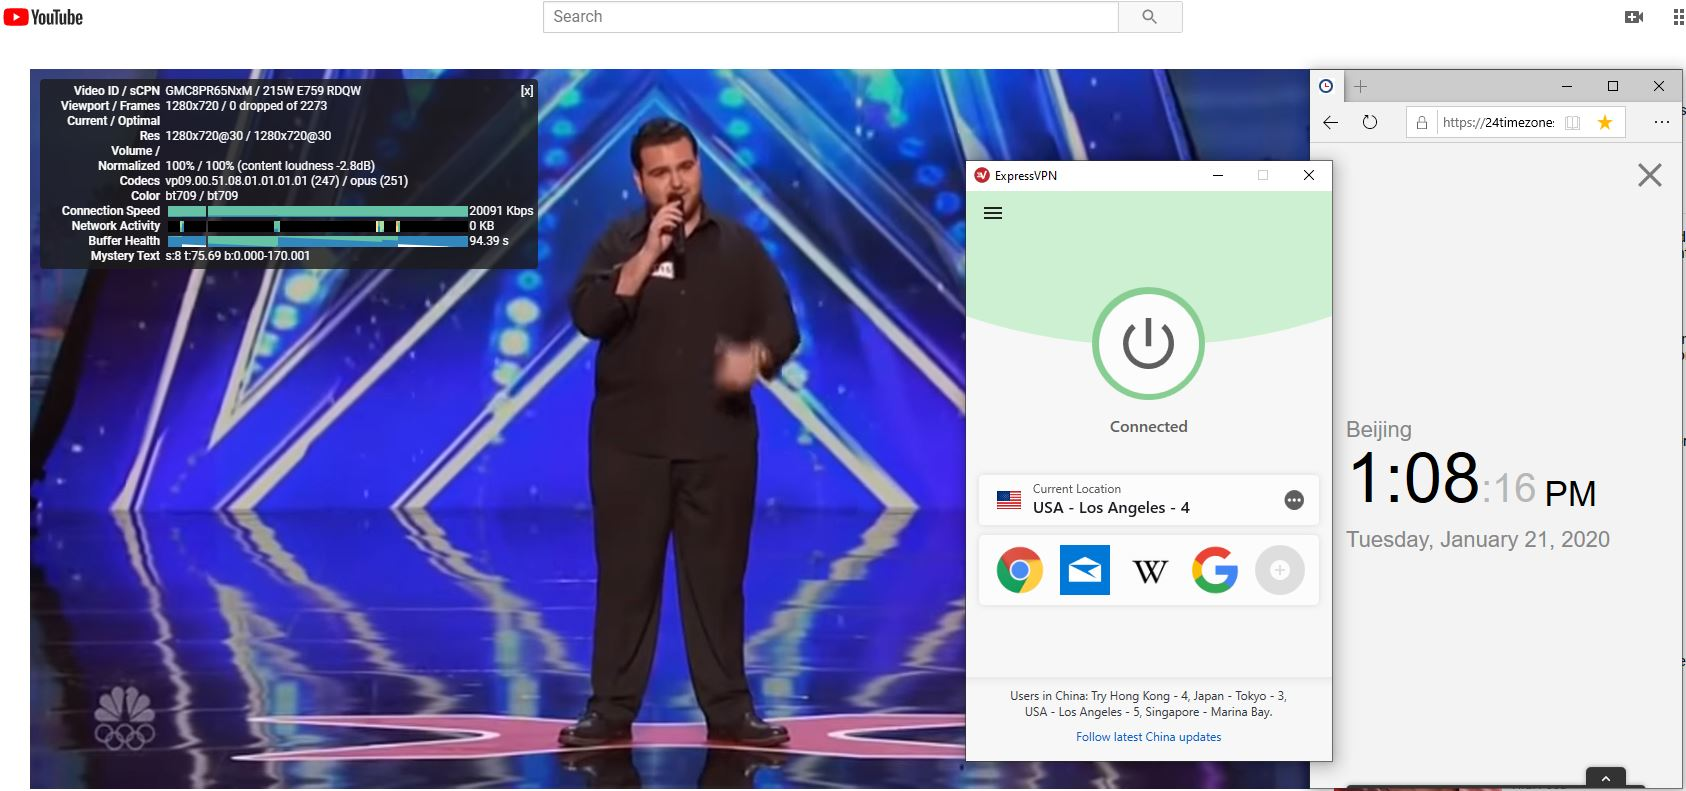 Windows10 ExpressVPN USA - Los Angeles -4 中国VPN翻墙 科学上网 Youtube测速-20200121